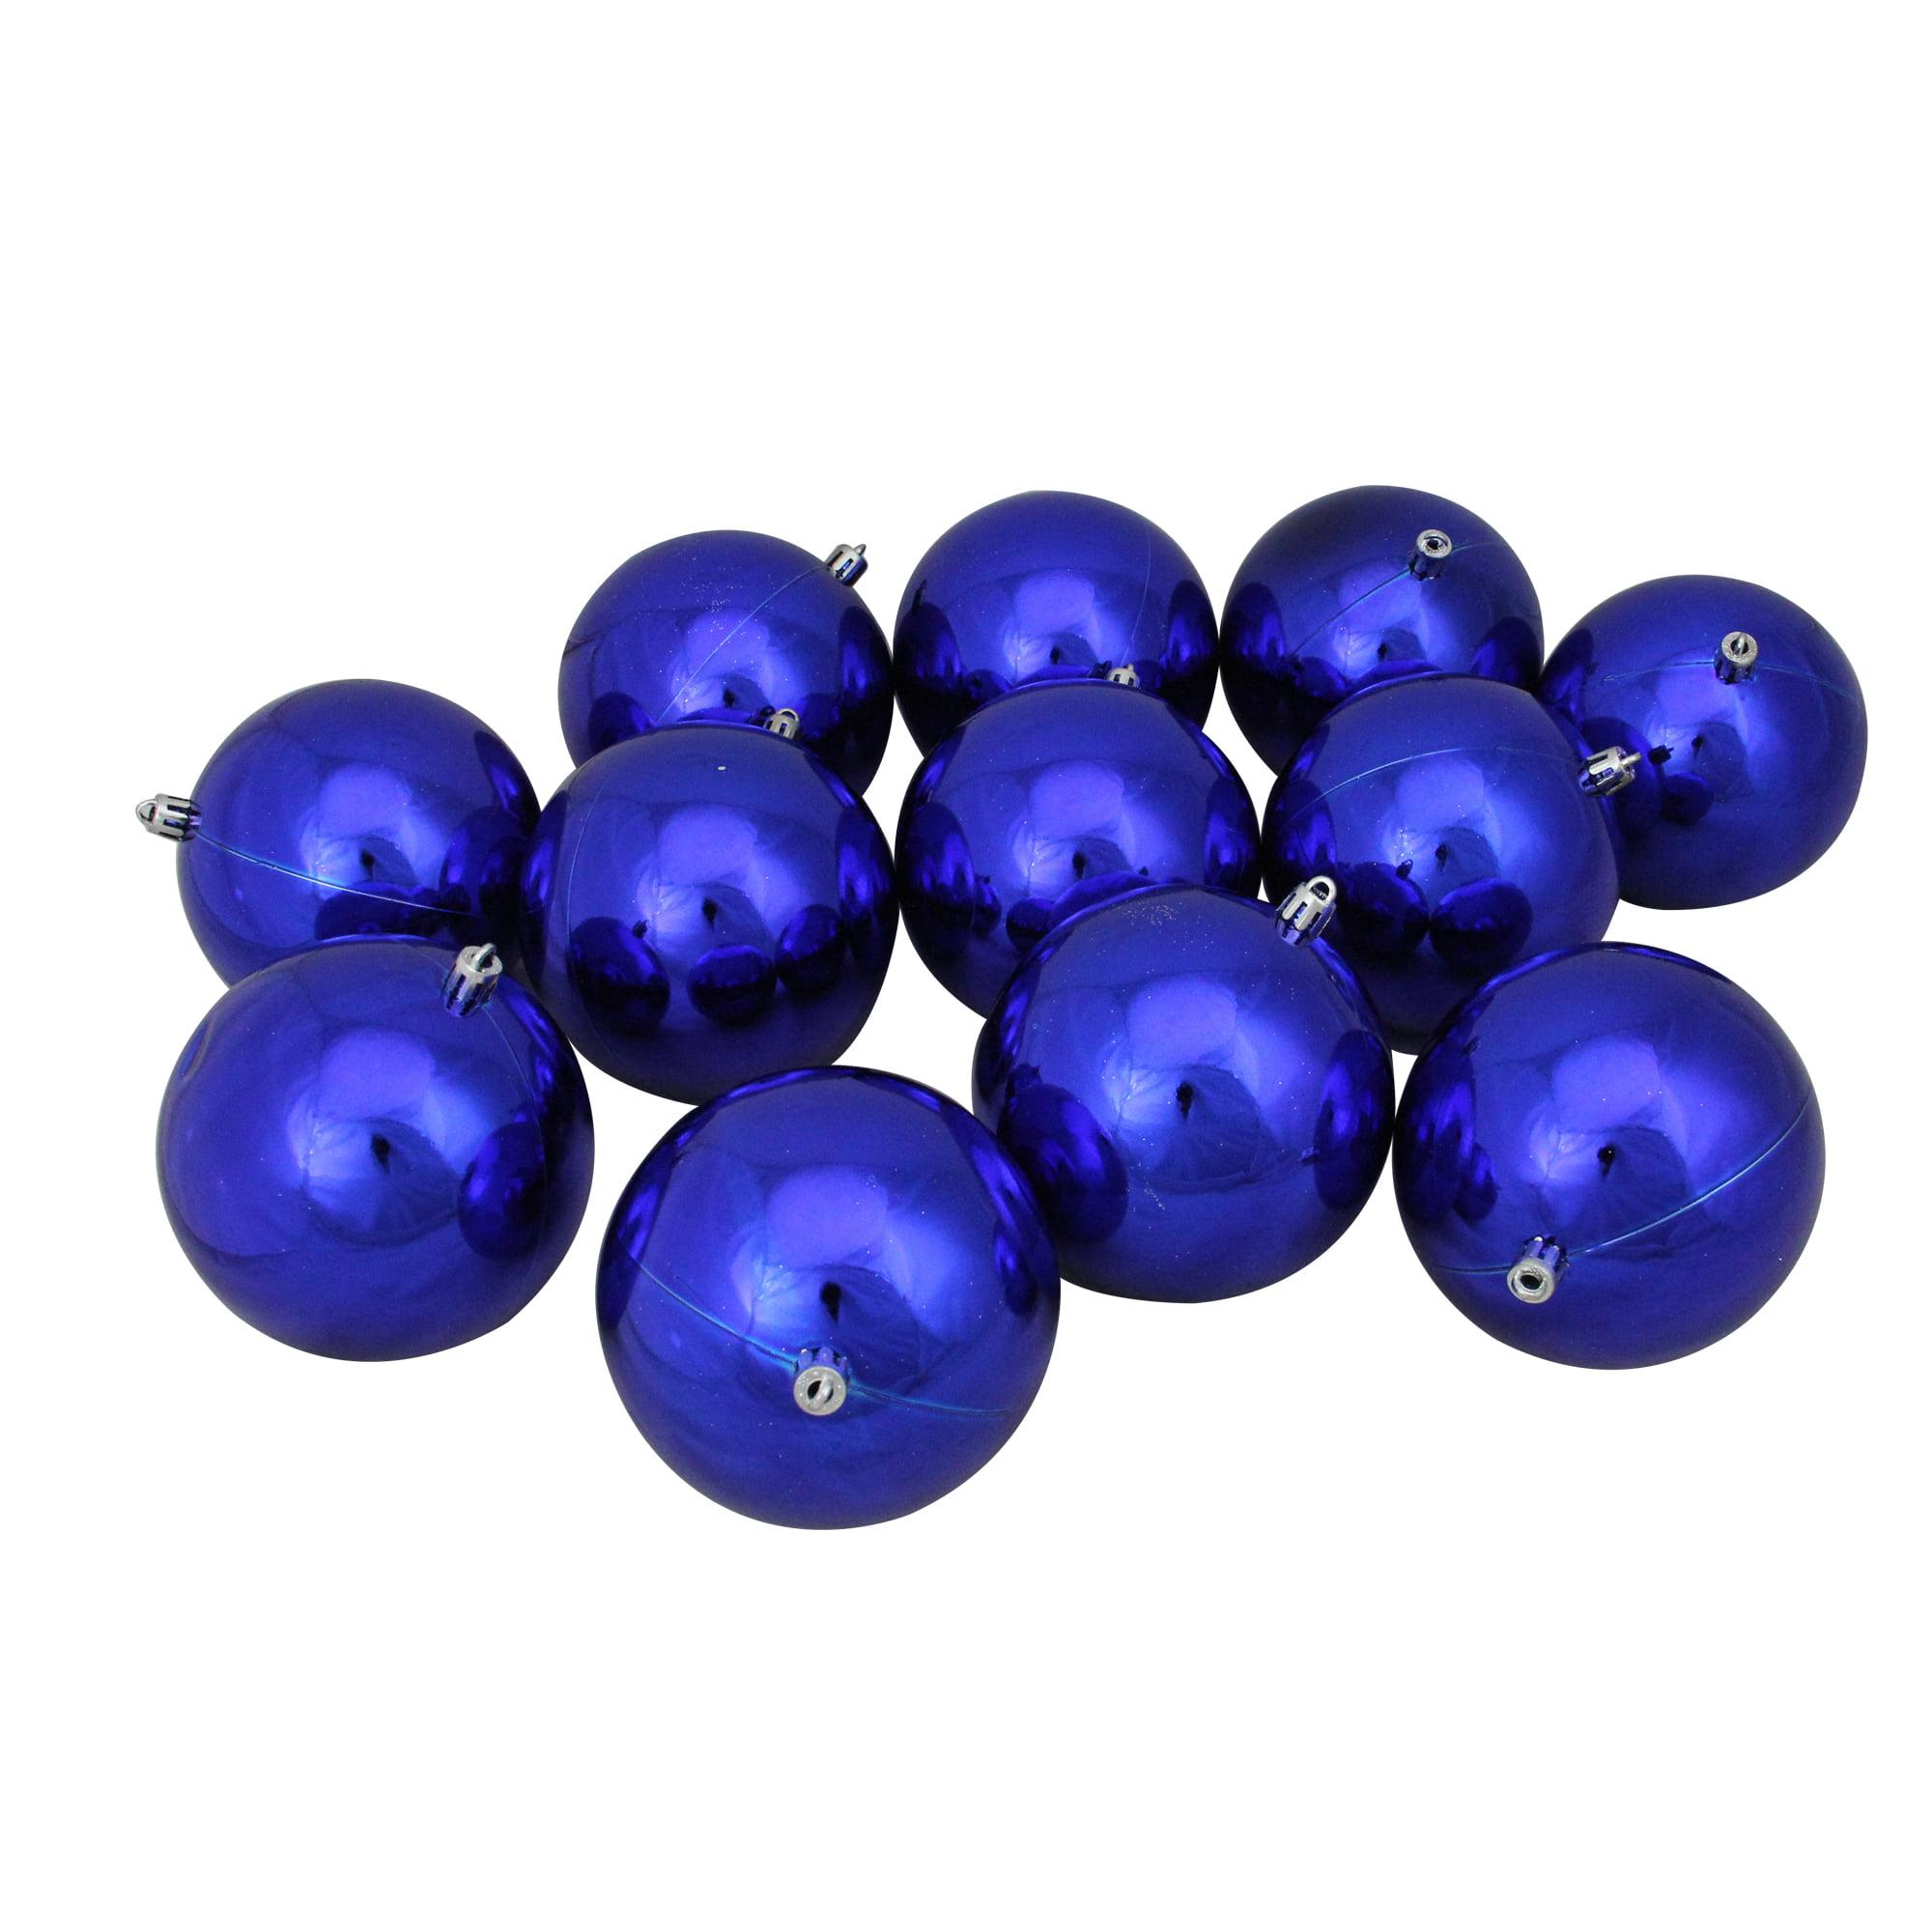 "12ct Vegas Gold Shatterproof Shiny Christmas Ball Ornaments 4"" (100mm)"